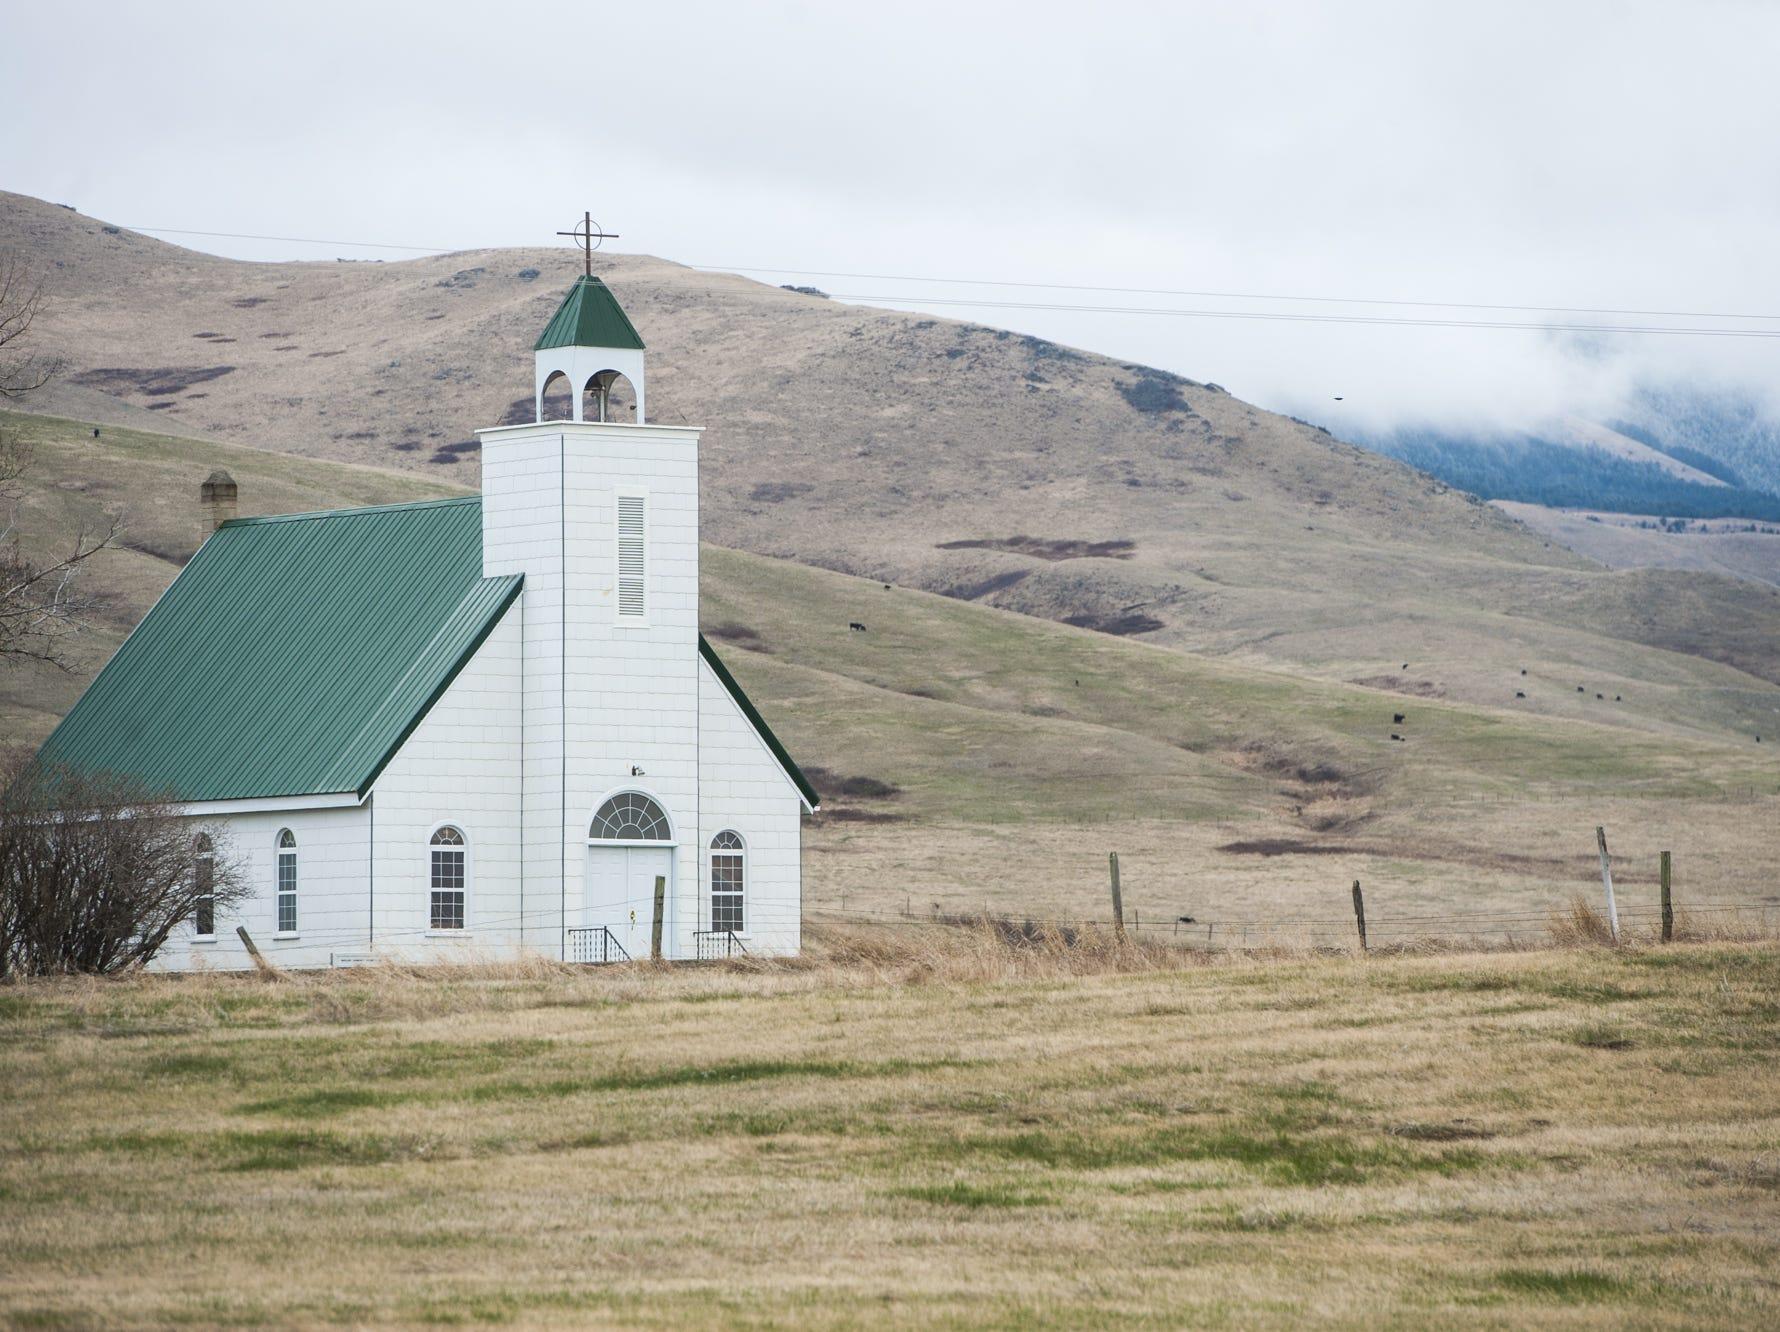 The Presbyterian church in Whitlash is set against a fog-enshrouded East Butte.